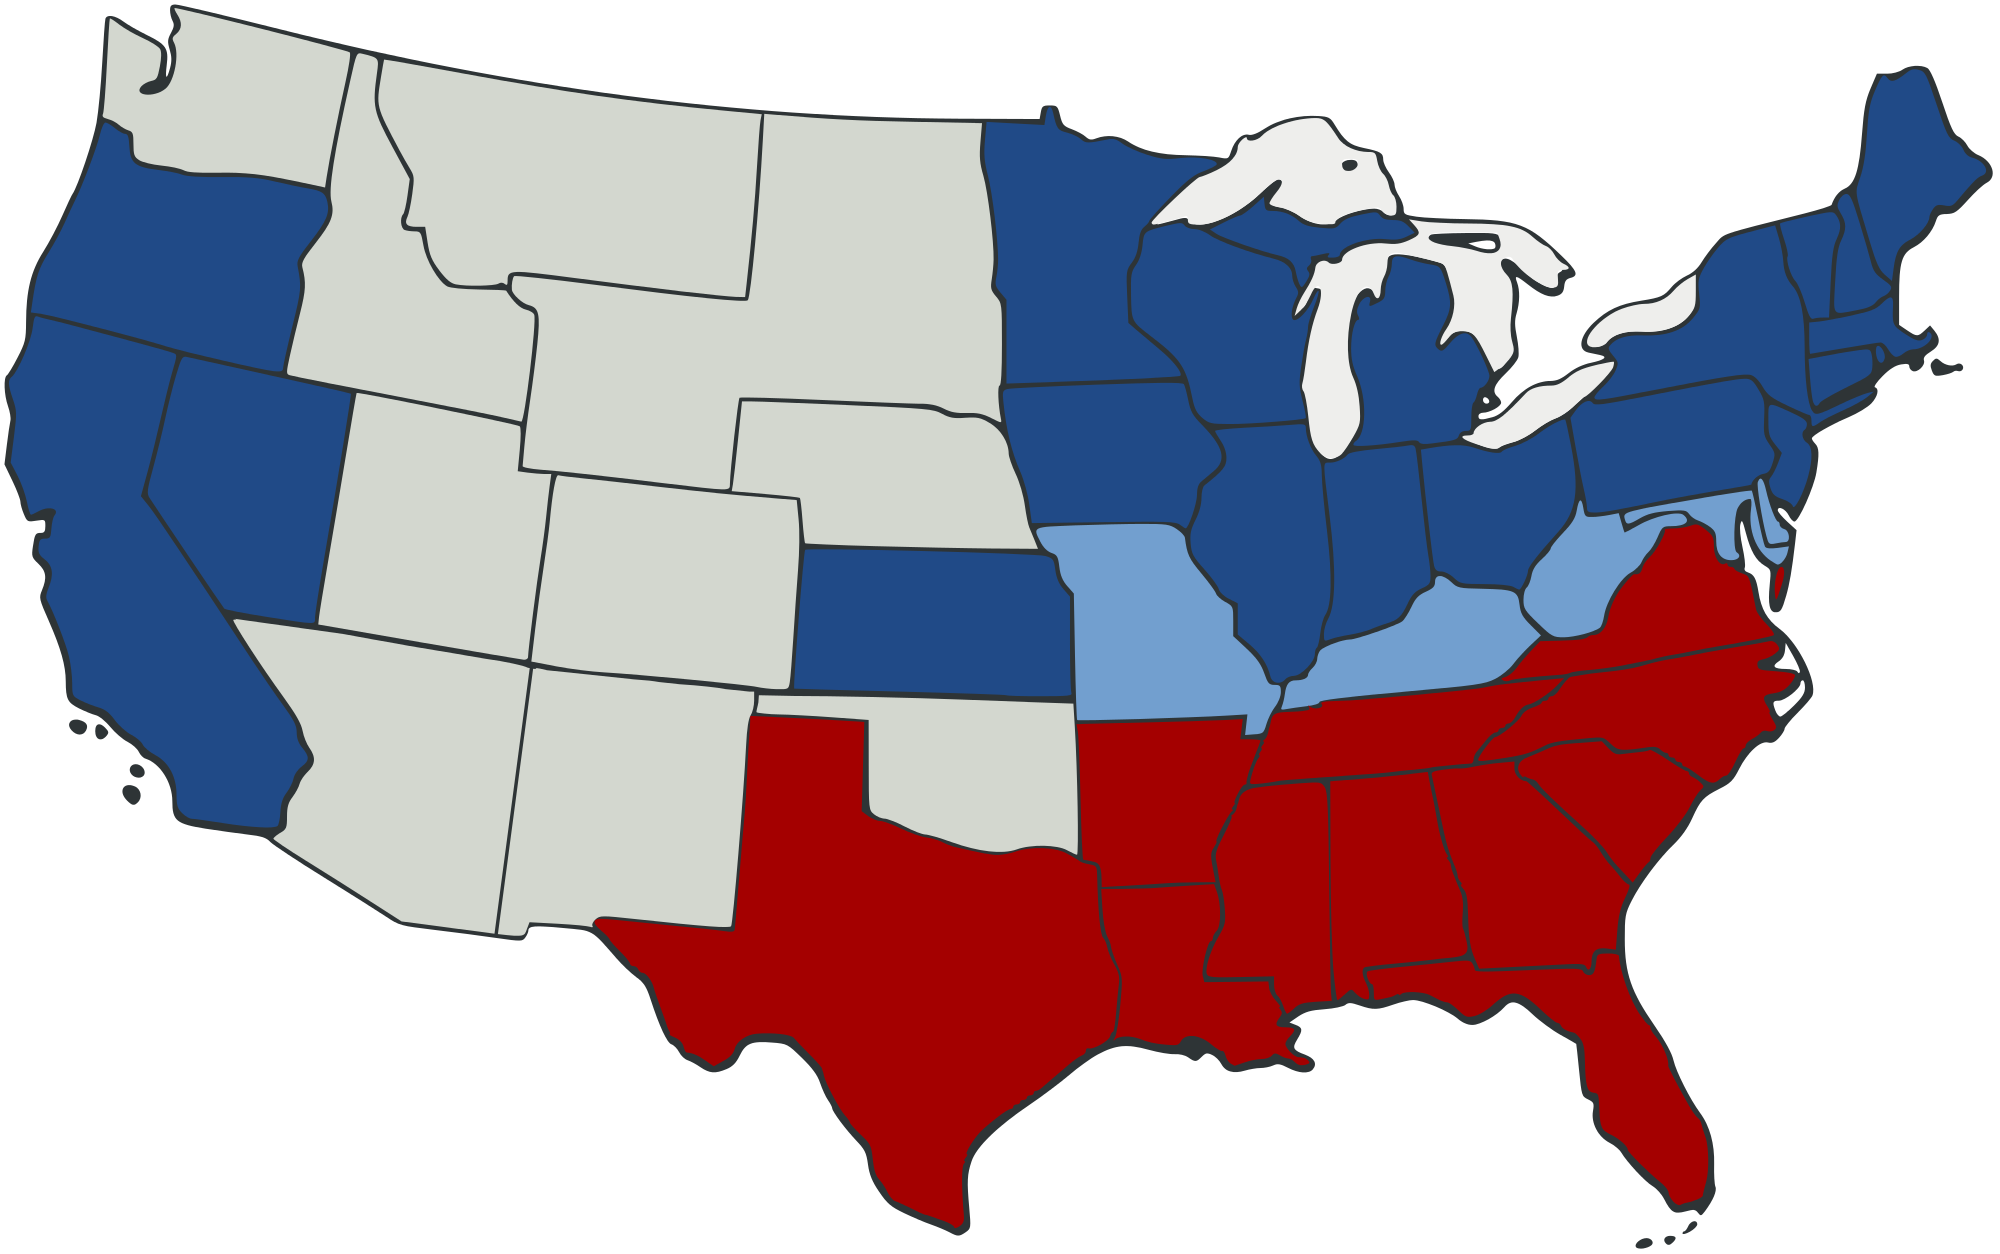 Usa border state